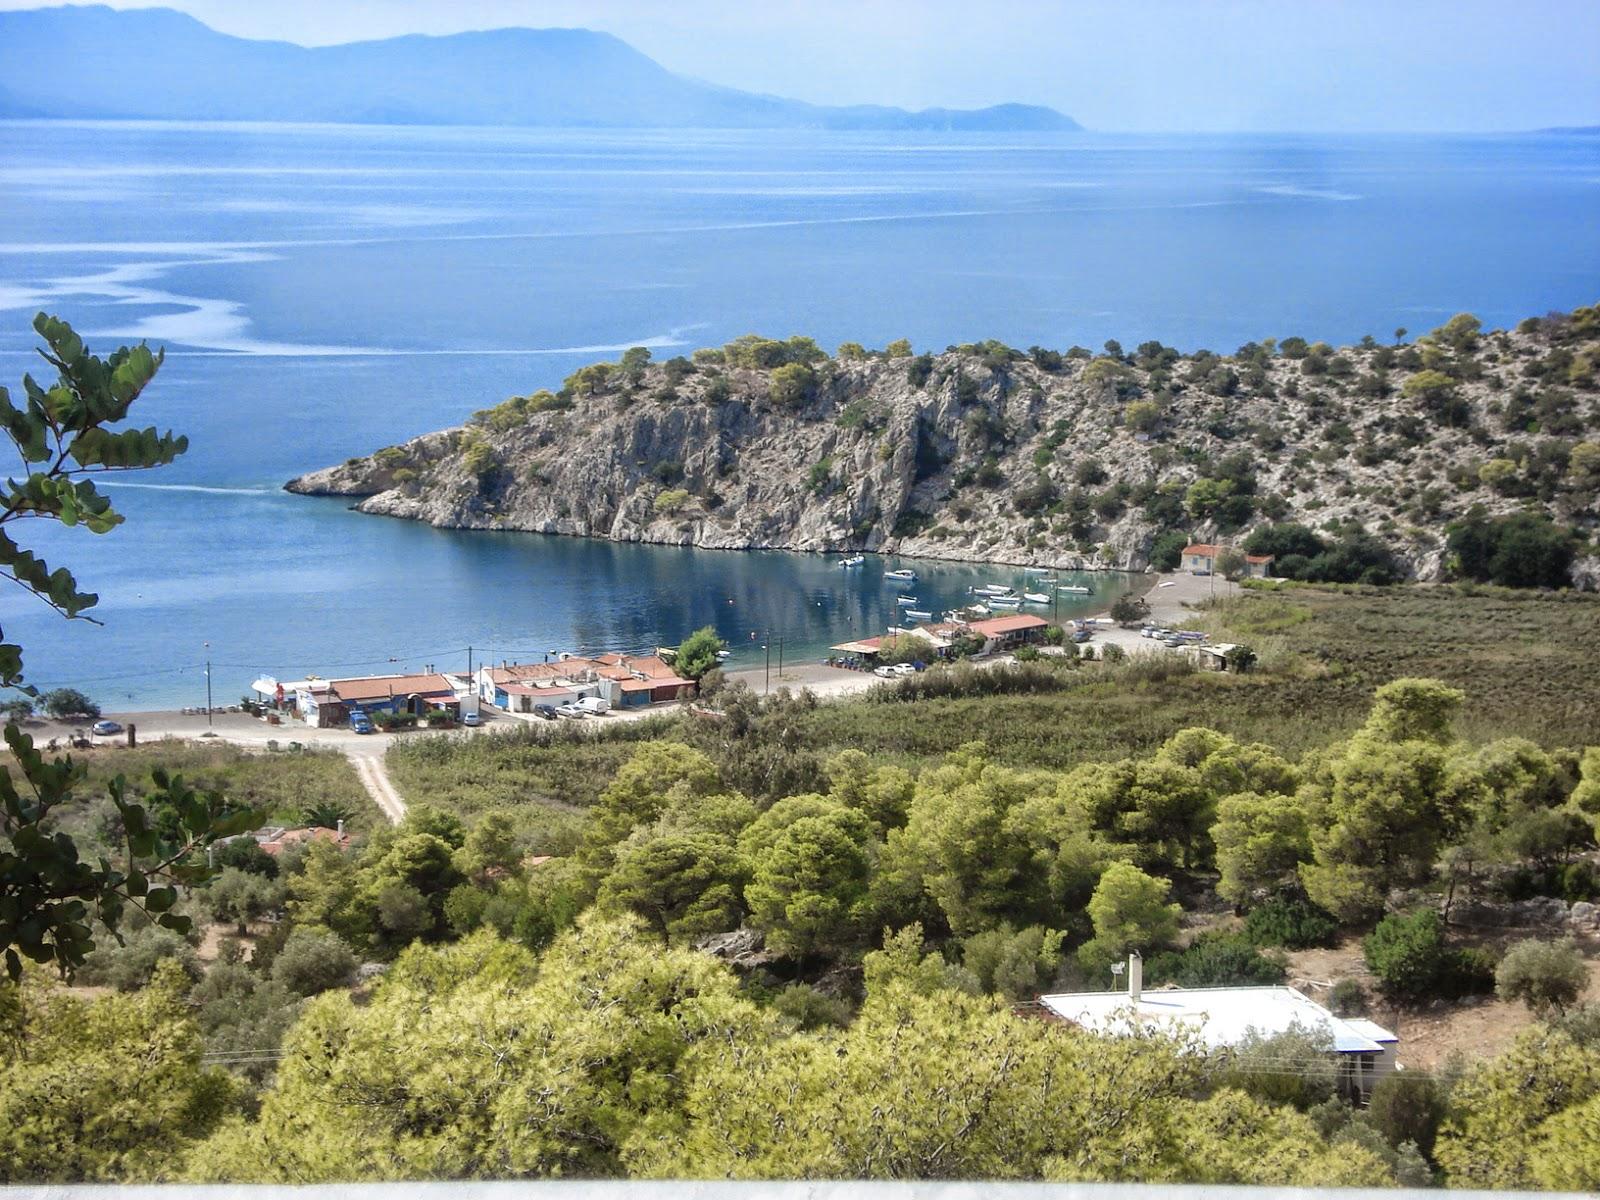 MotoRent Rentals Lease Adventure Athens Greece (Hellas ...